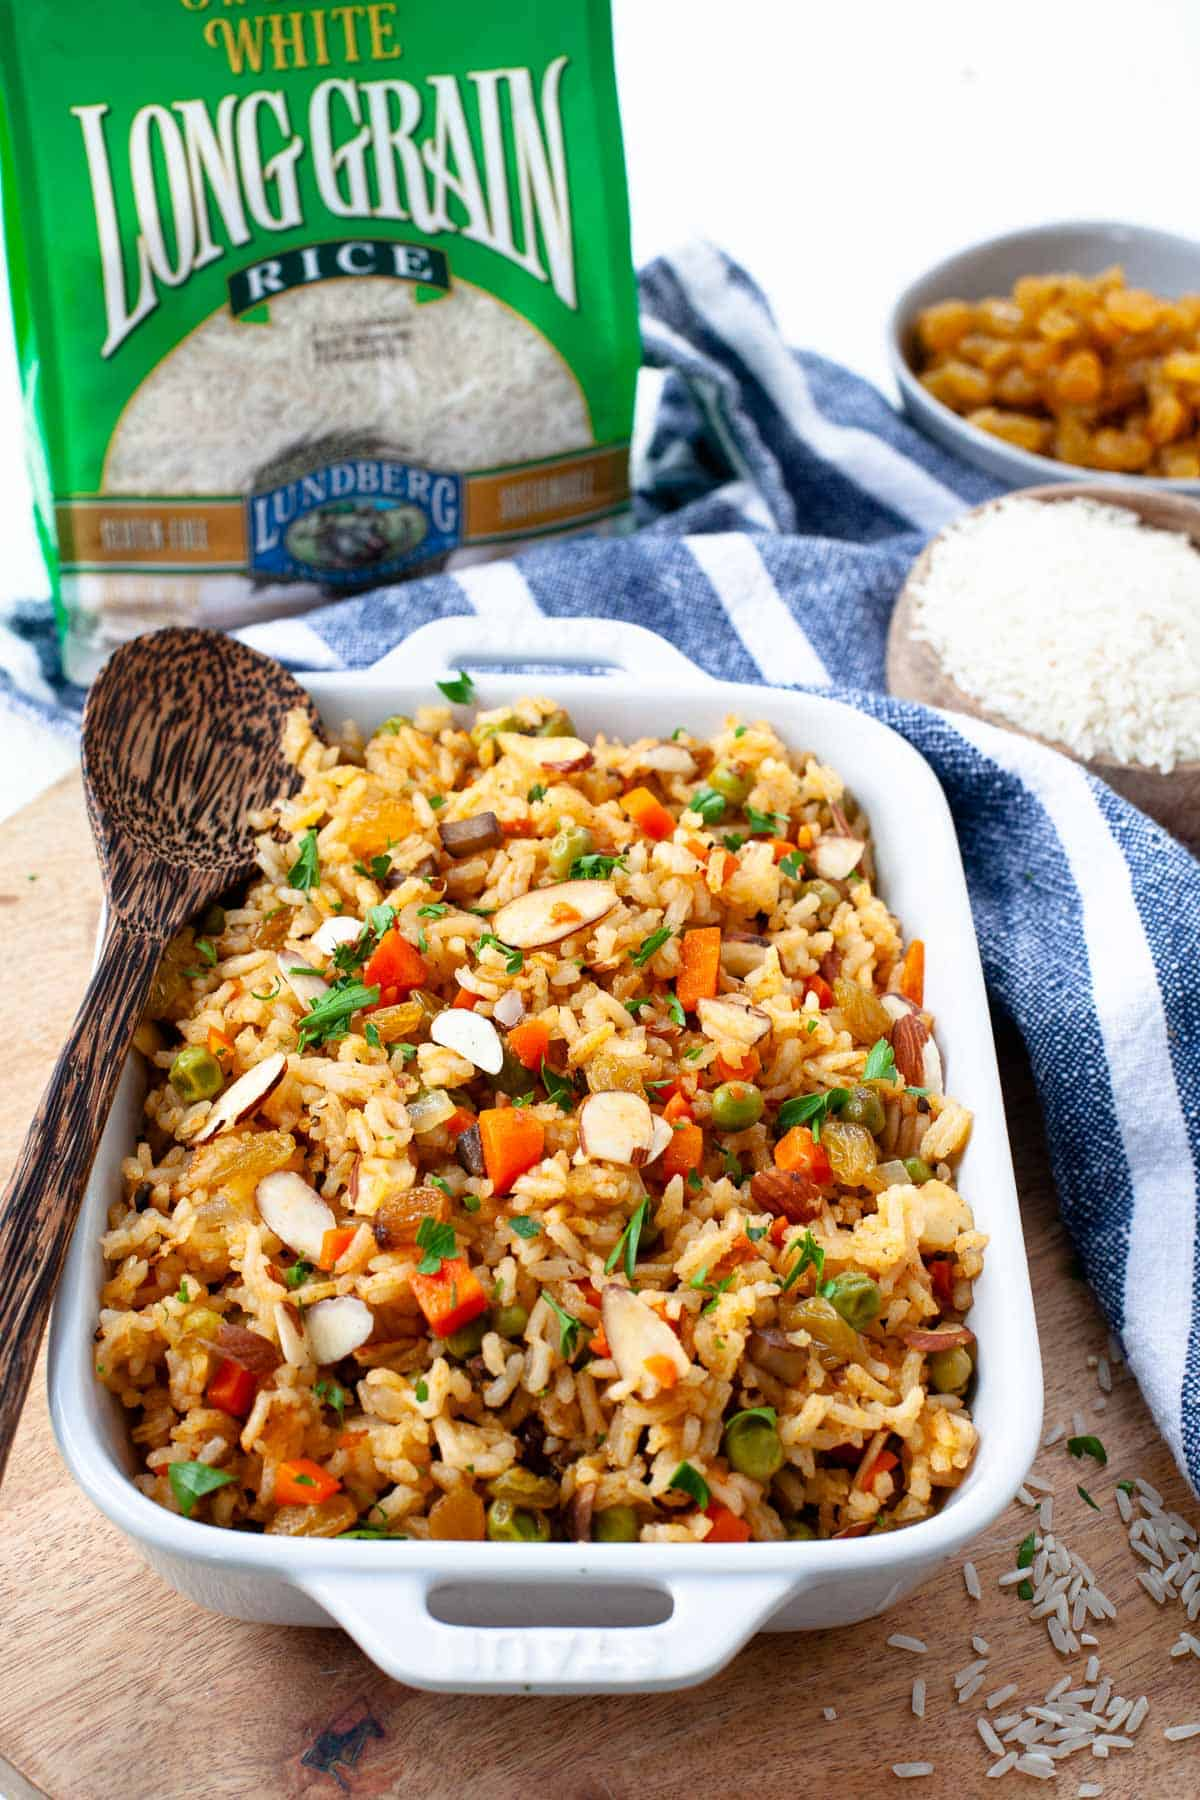 lundberg white long grain rice vegetarian rice pilaf casserole dish wooden spoon, blue towel, rice bowl